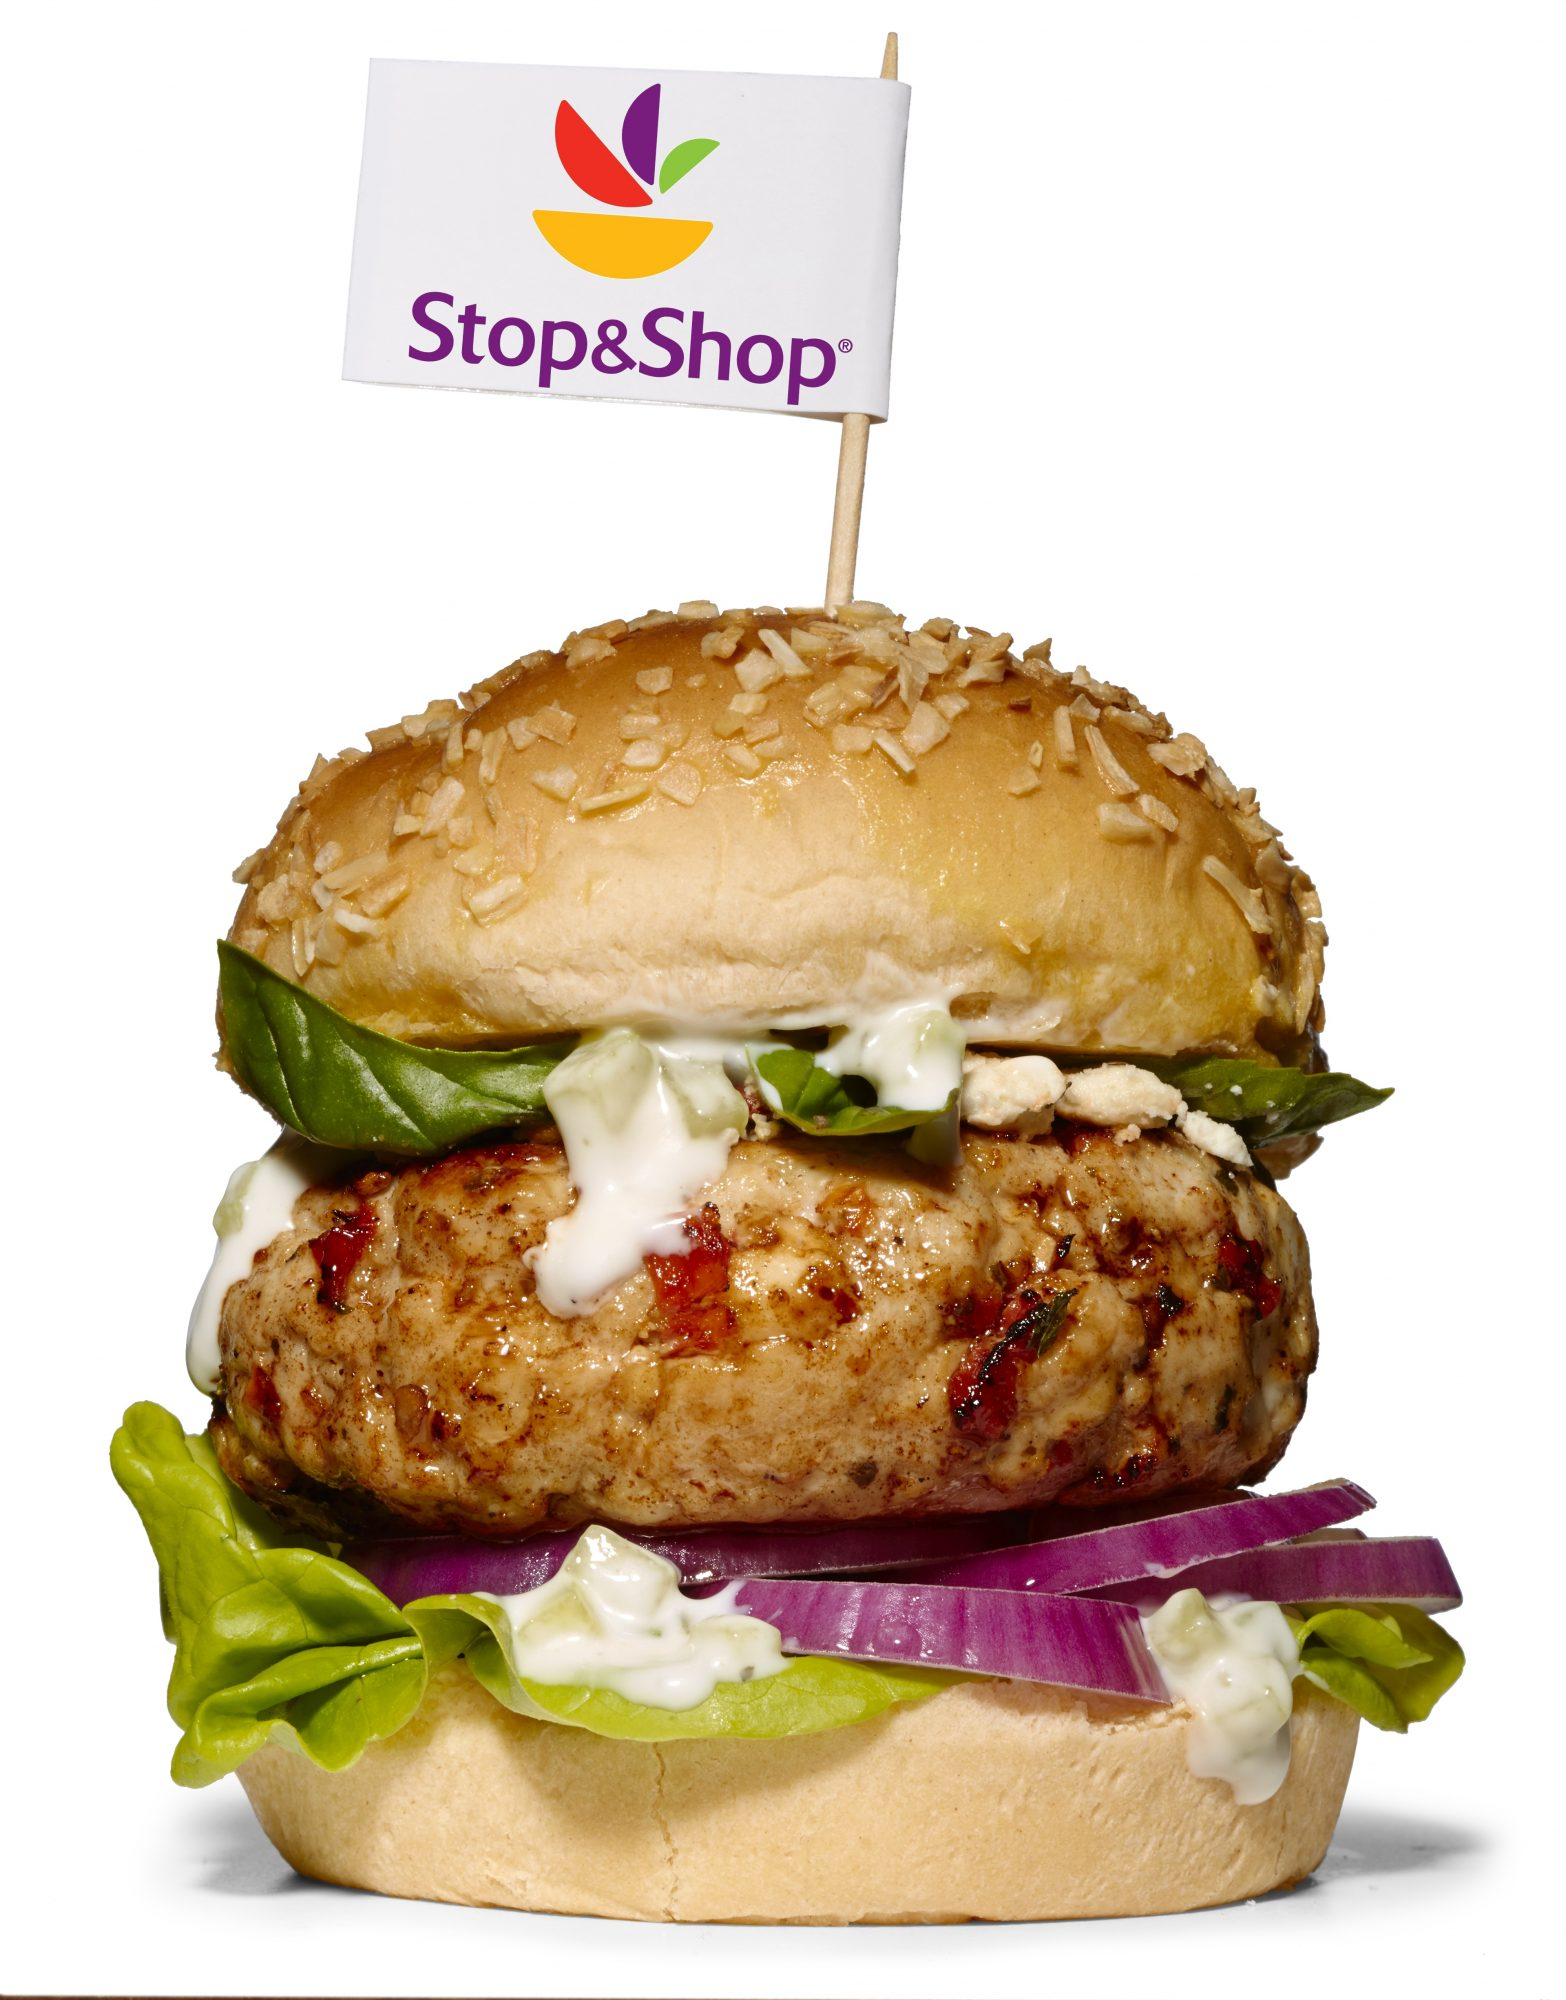 Stop and Shop burger